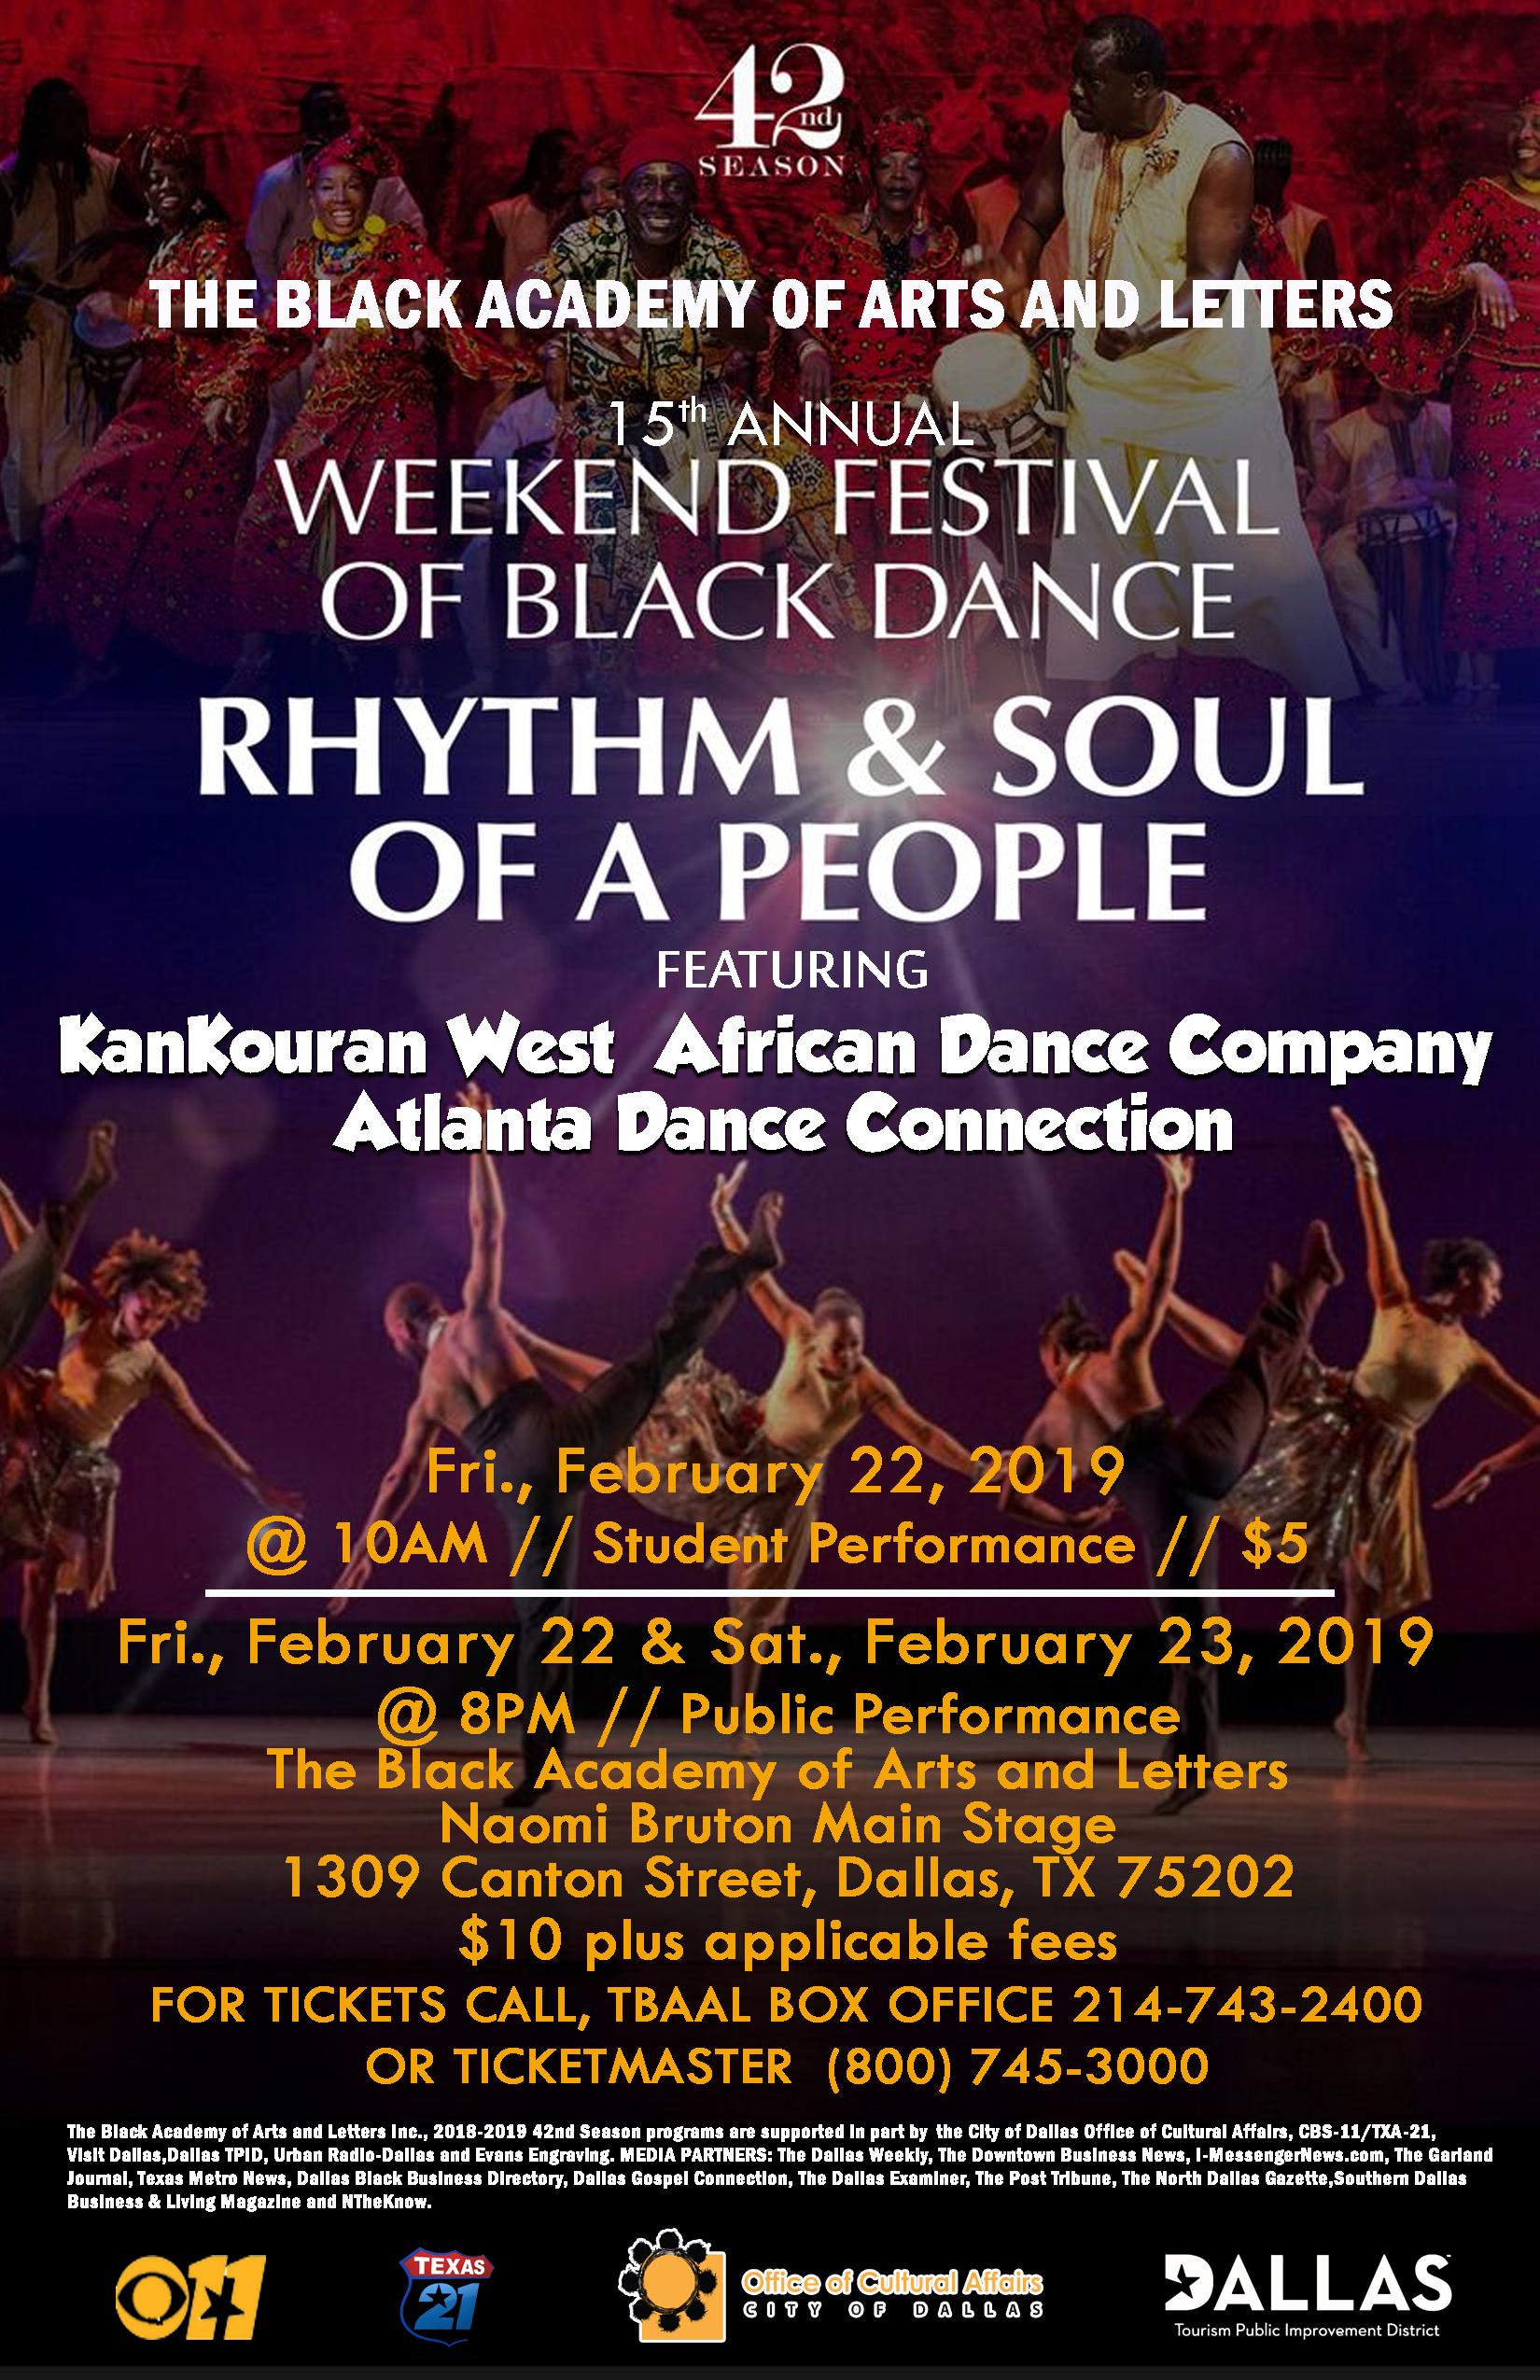 15TH ANNUAL WEEKEND FESTIVAL OF BLACK DANCE: FEBRUARY 22, 2019